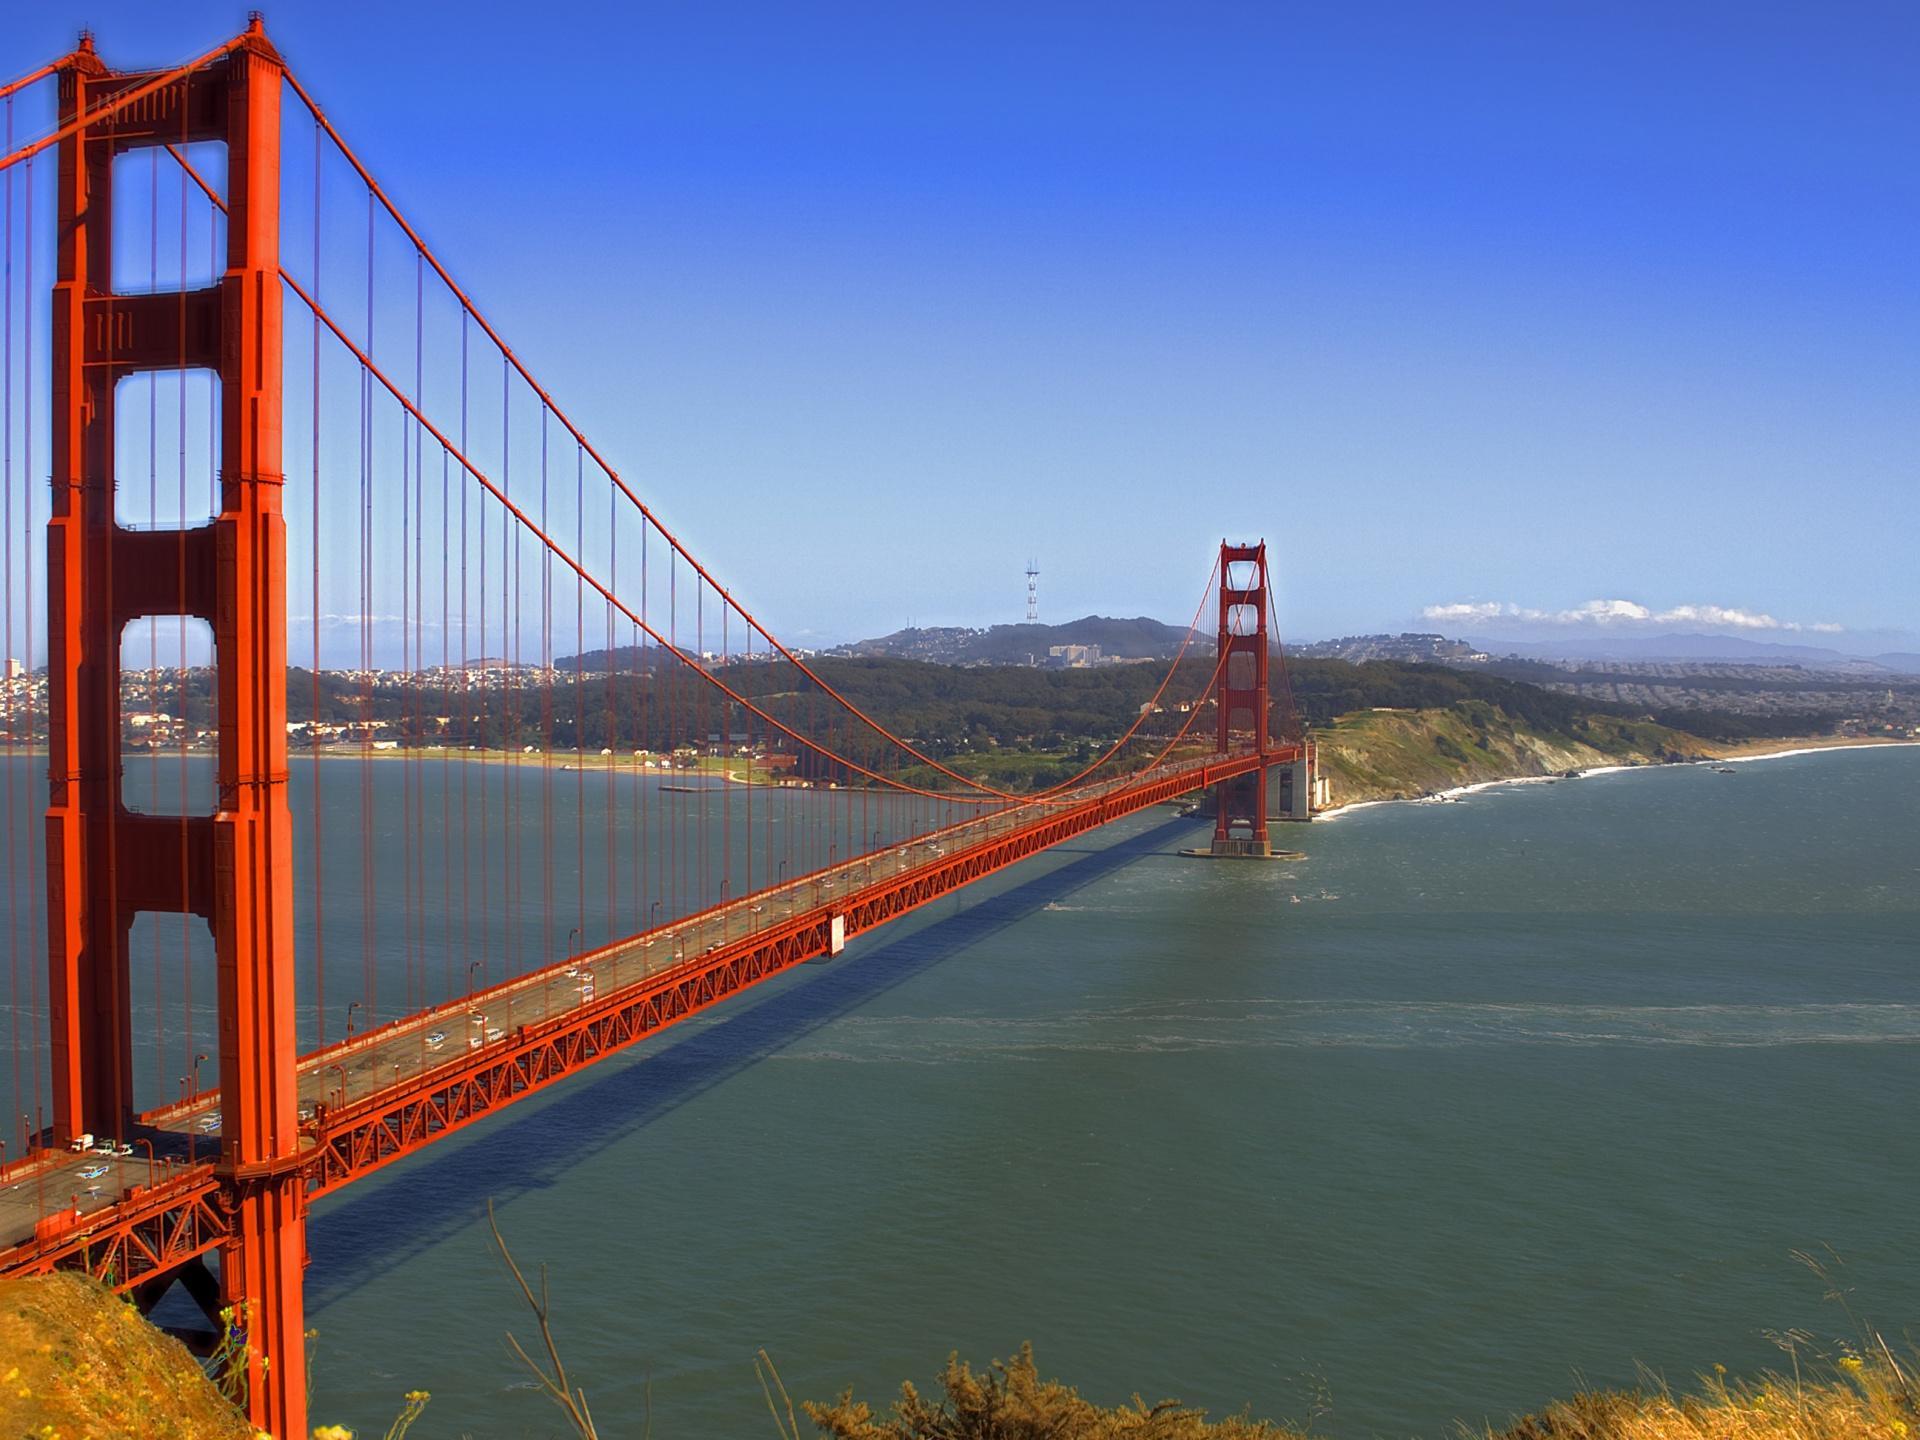 Golden Gate Bridge San Francisco Wallpapers Top Free Golden Gate Bridge San Francisco Backgrounds Wallpaperaccess